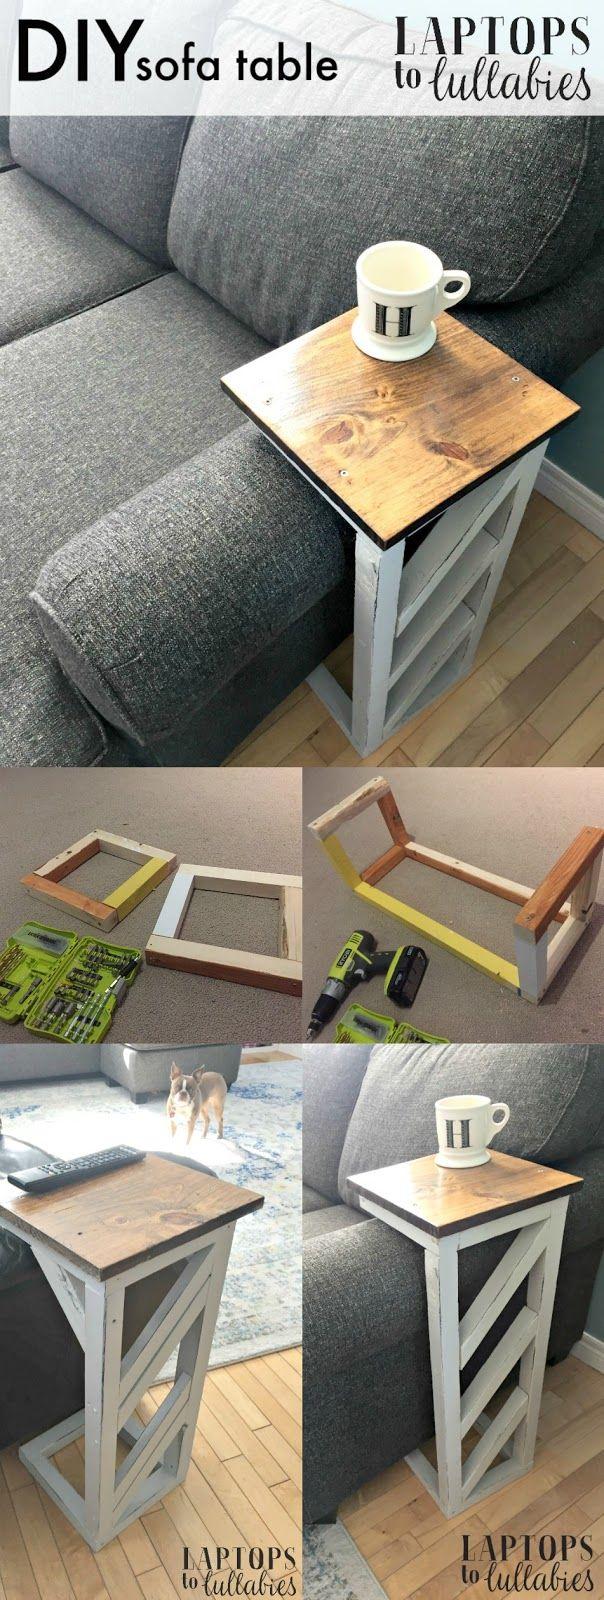 laptops to lullabies easy diy sofa tables honey do list rh pinterest com